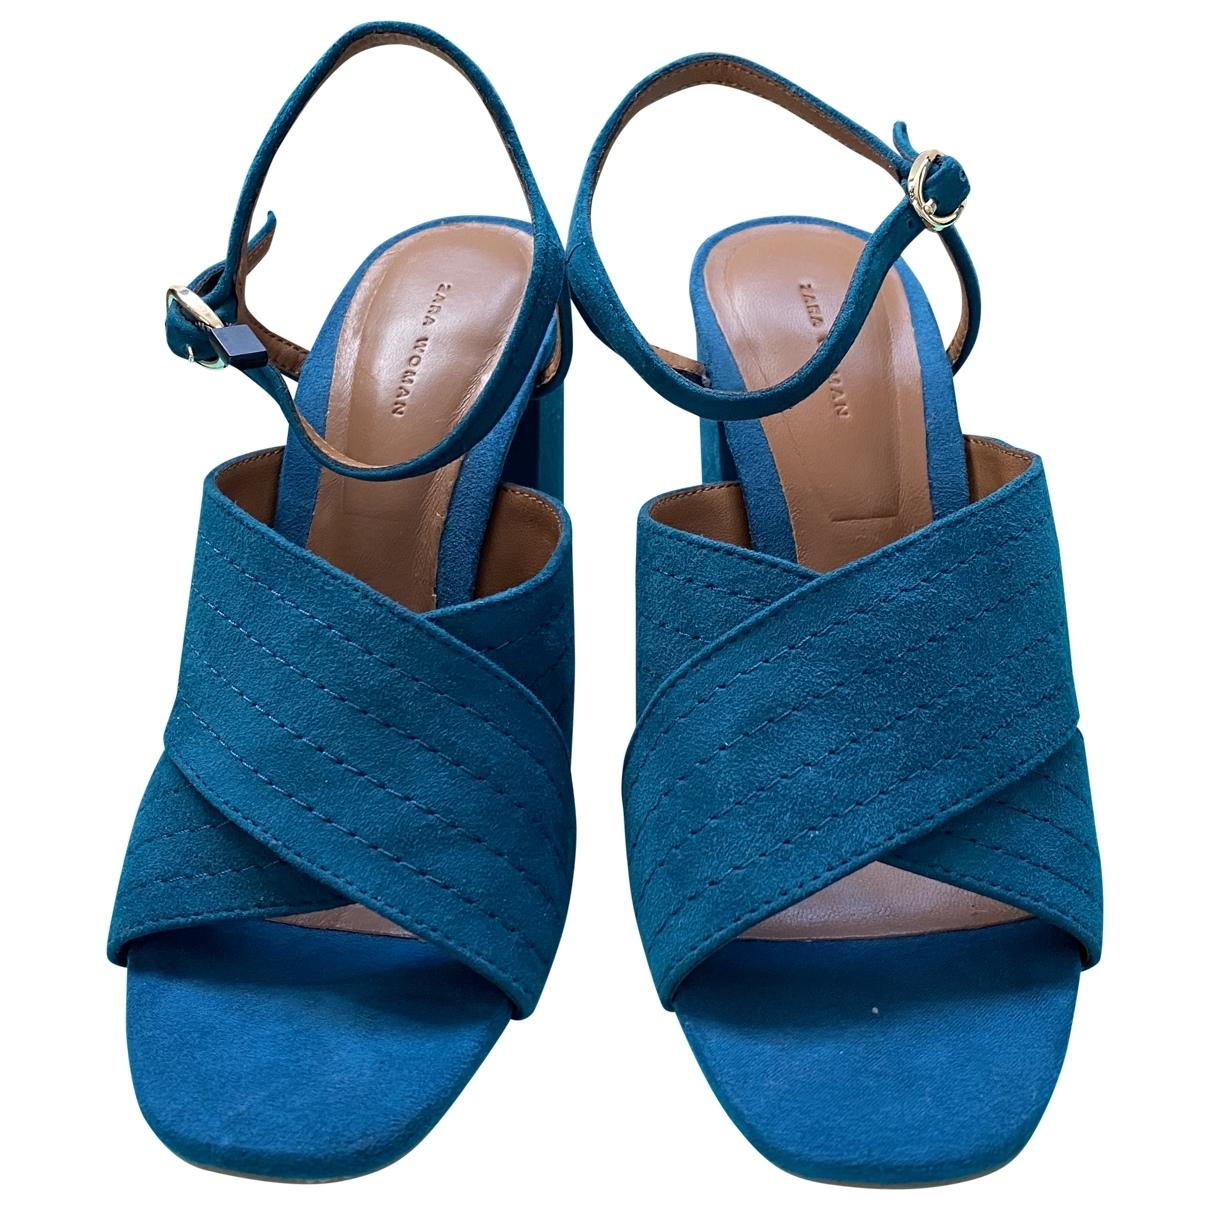 Zara \N Turquoise Leather Sandals for Women 36 EU